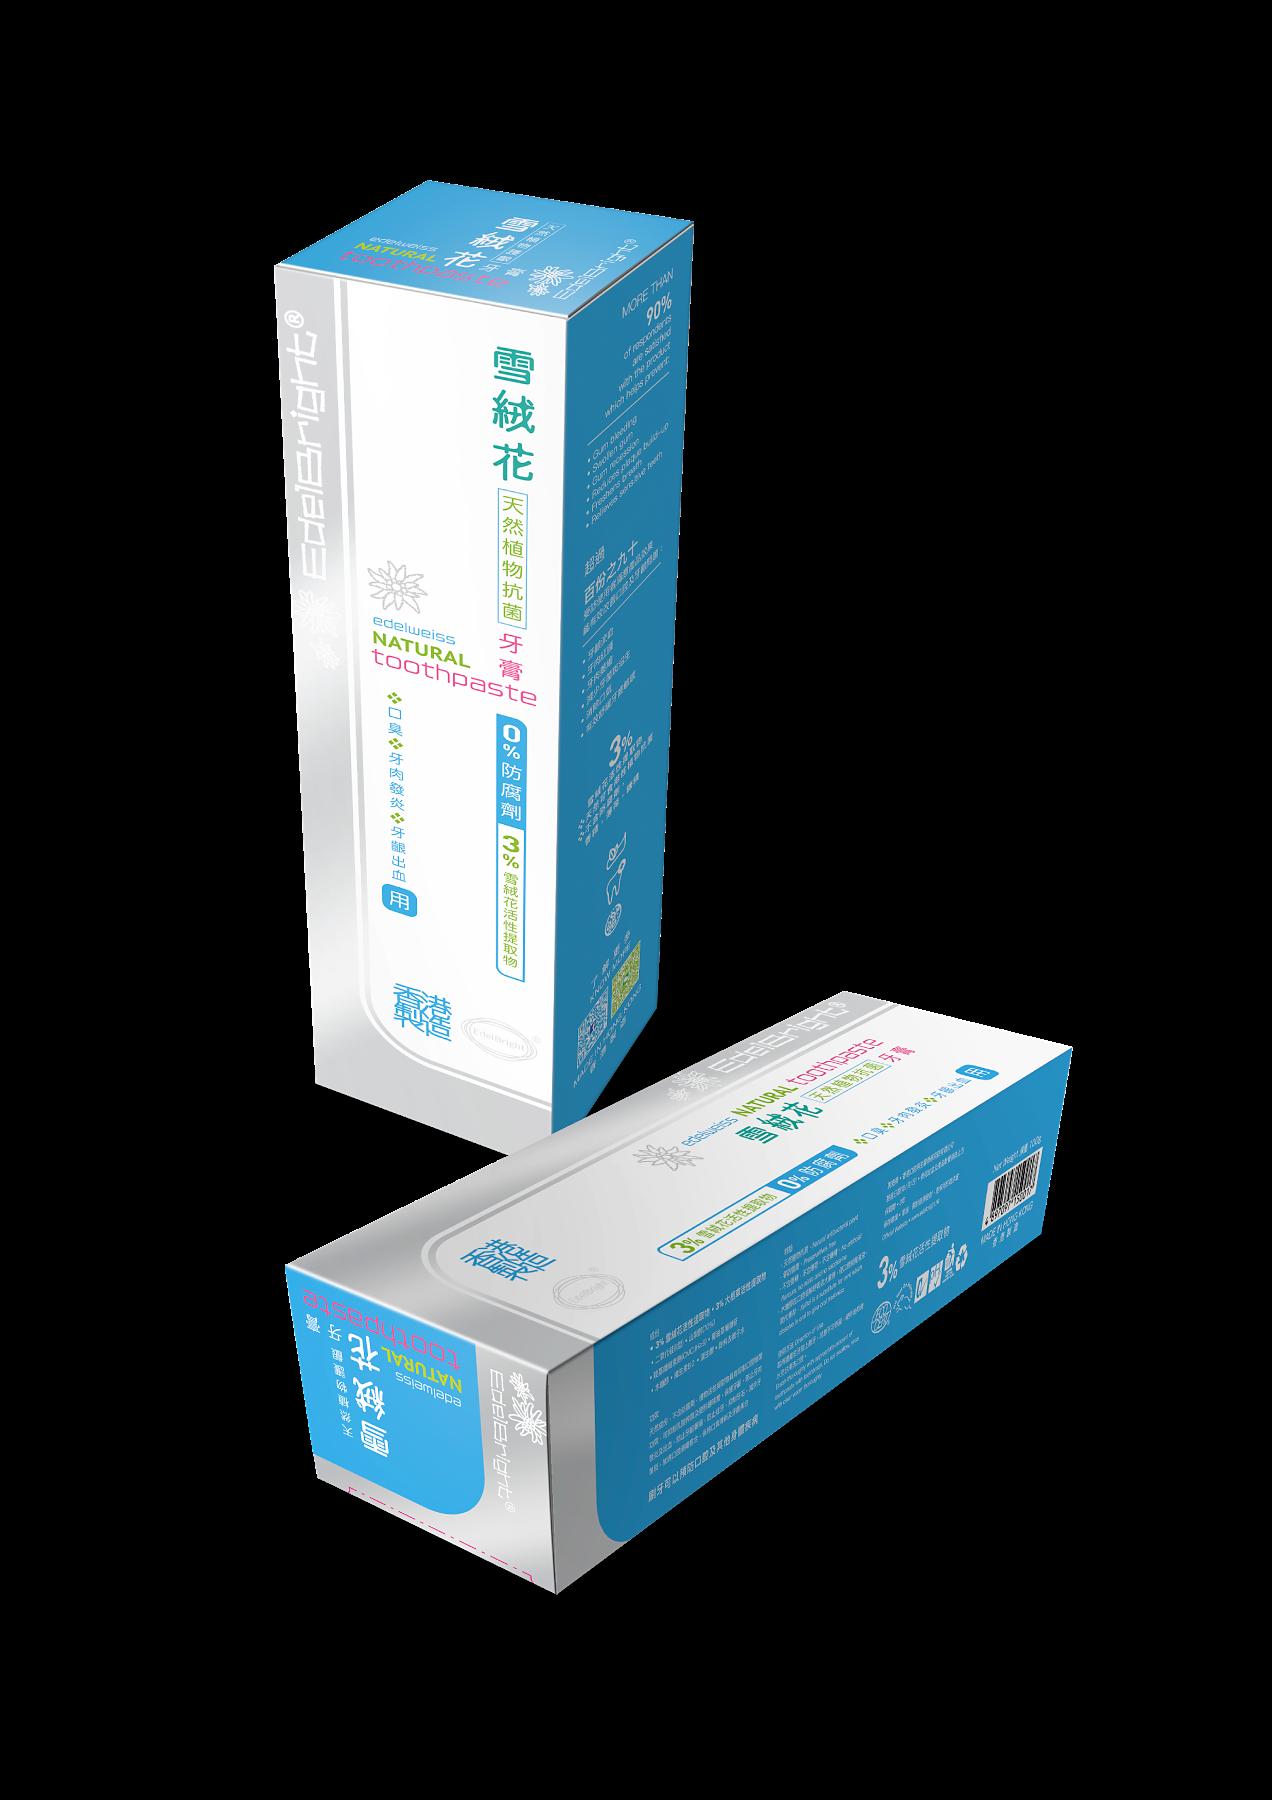 Edelbright Standard Toothpaste Box